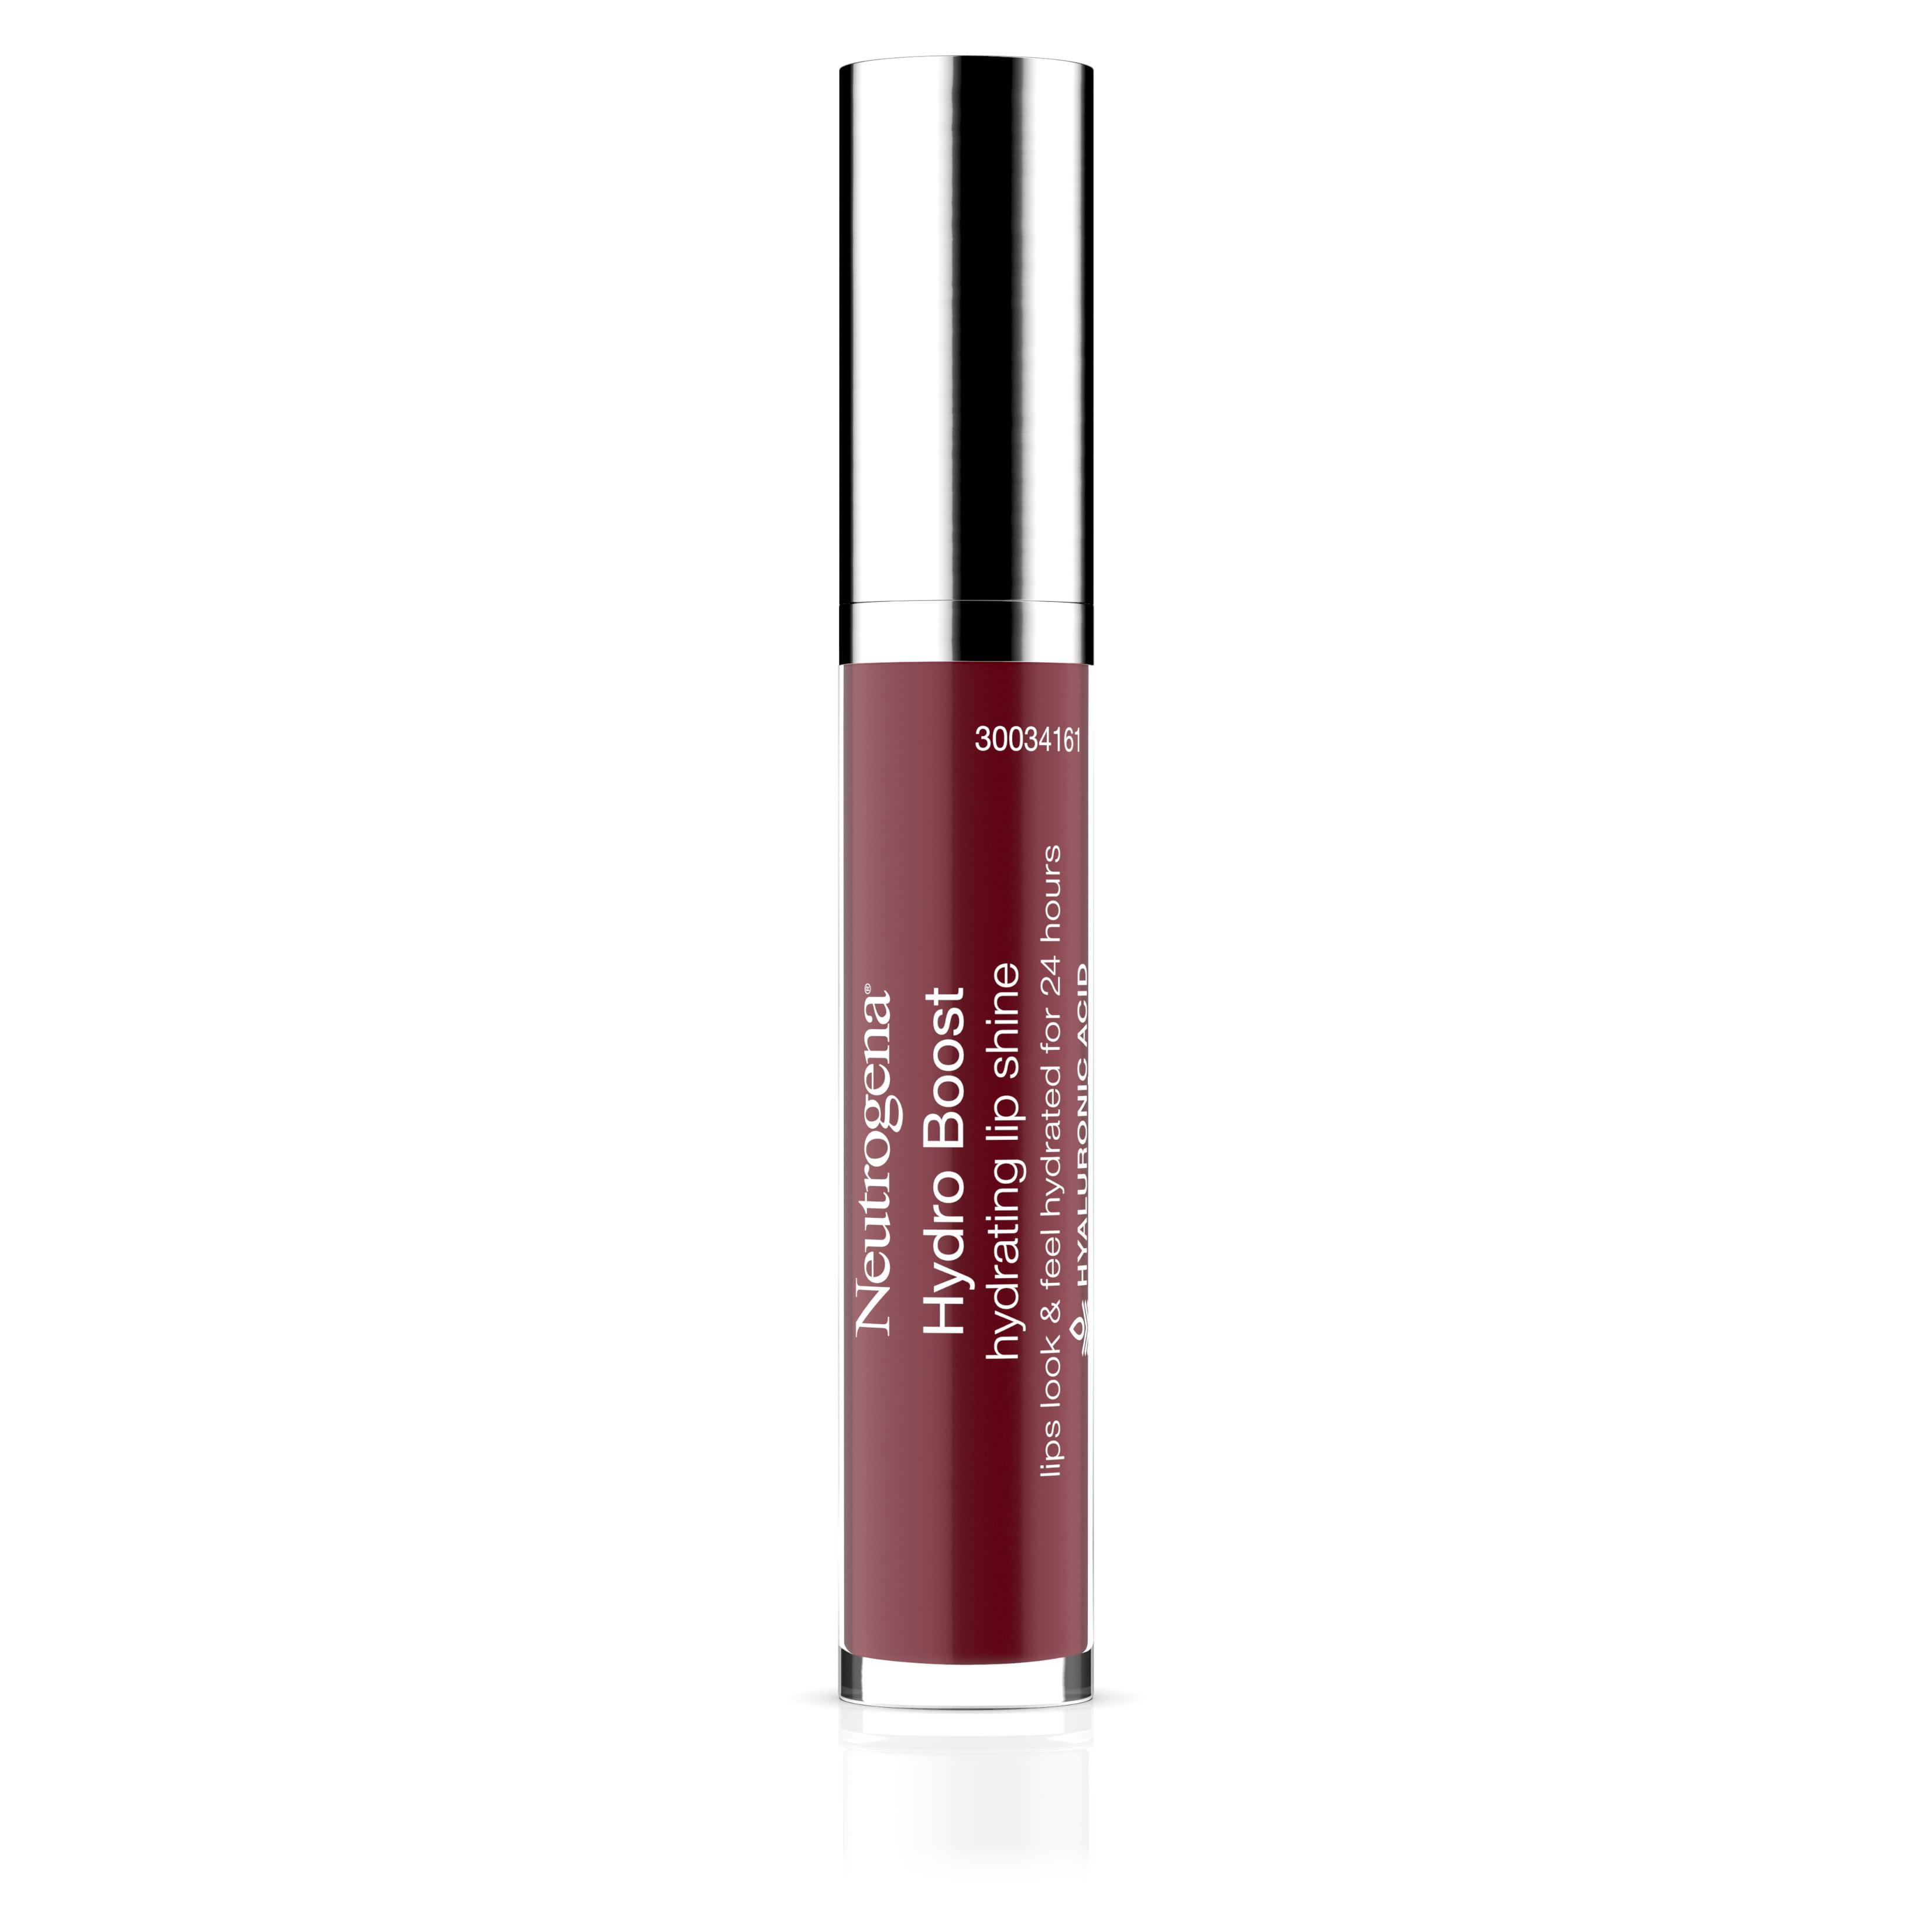 Neutrogena Hydro Boost Hydrating Lip Shine, 70 Velvet Wine Color 0.10 Oz